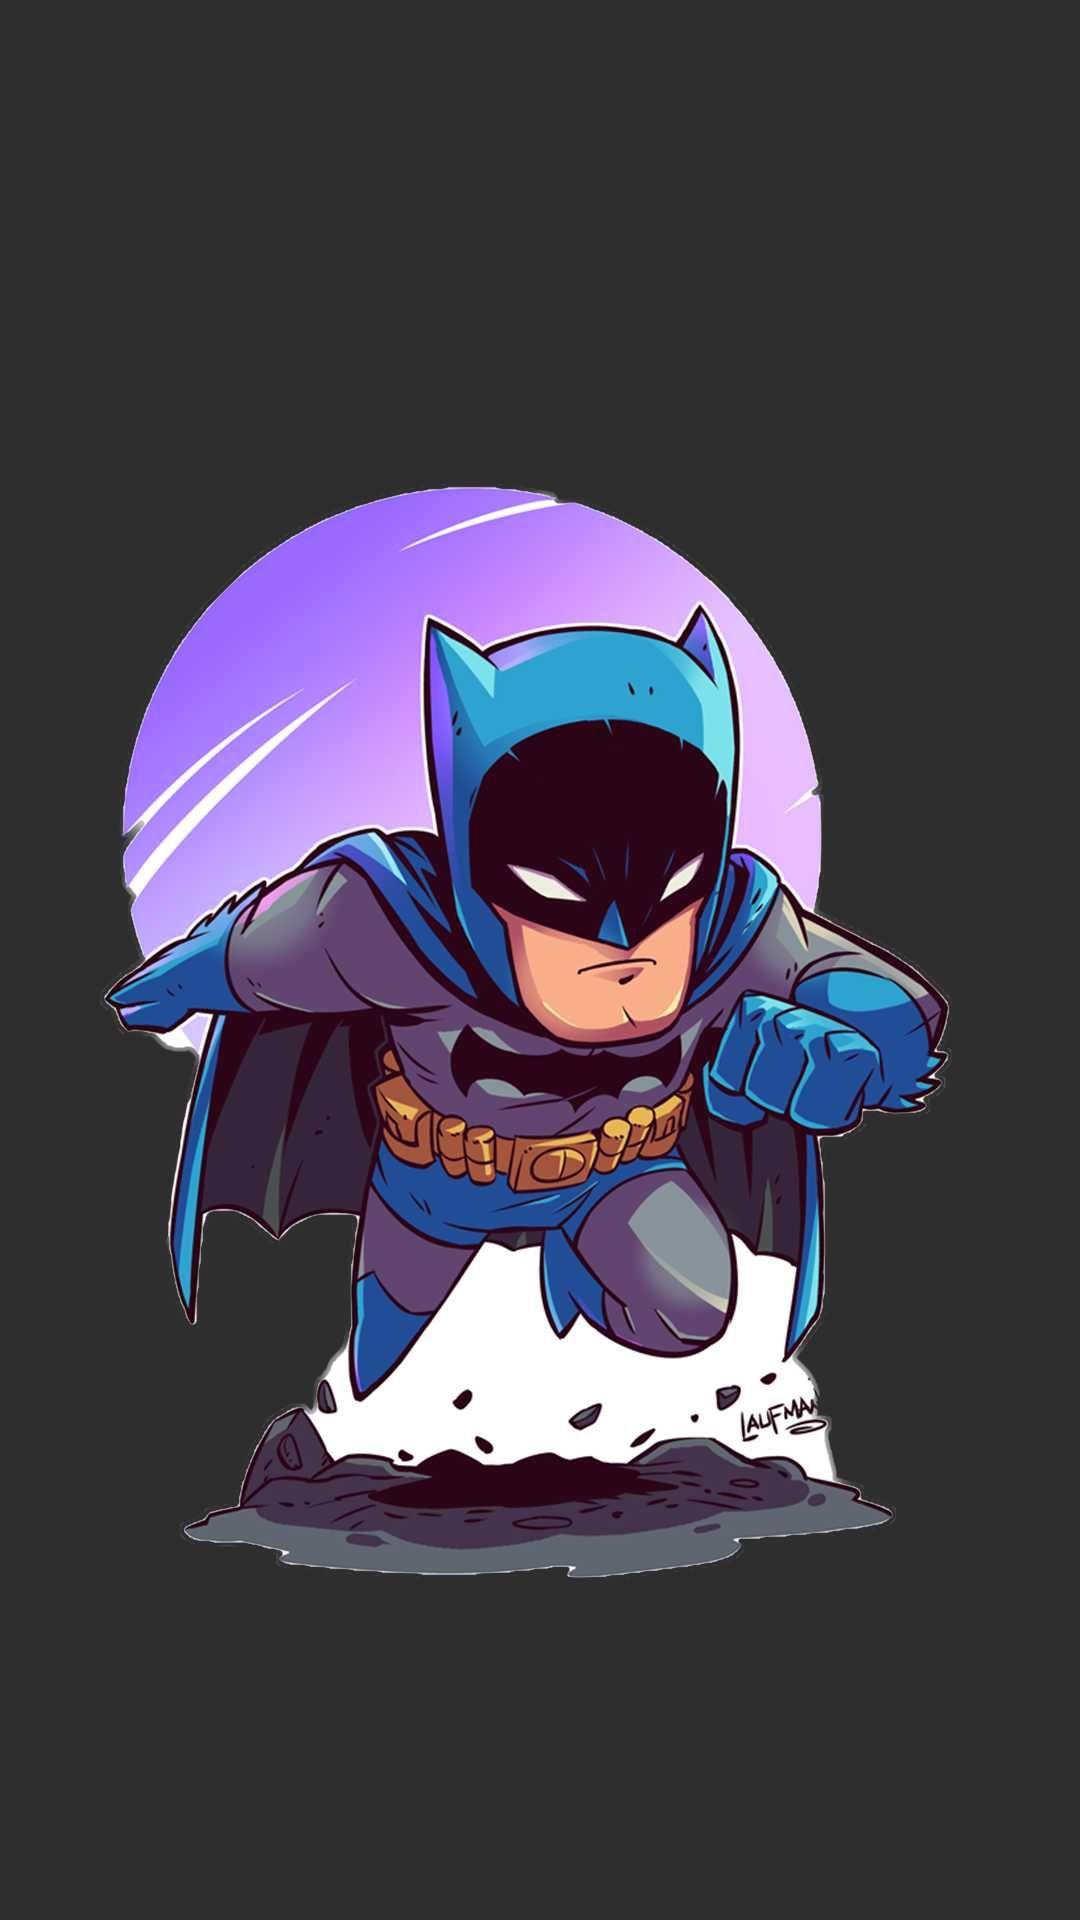 Batman Animated Art Iphone Wallpaper Batman Cartoon Batman Wallpaper Superhero Wallpaper